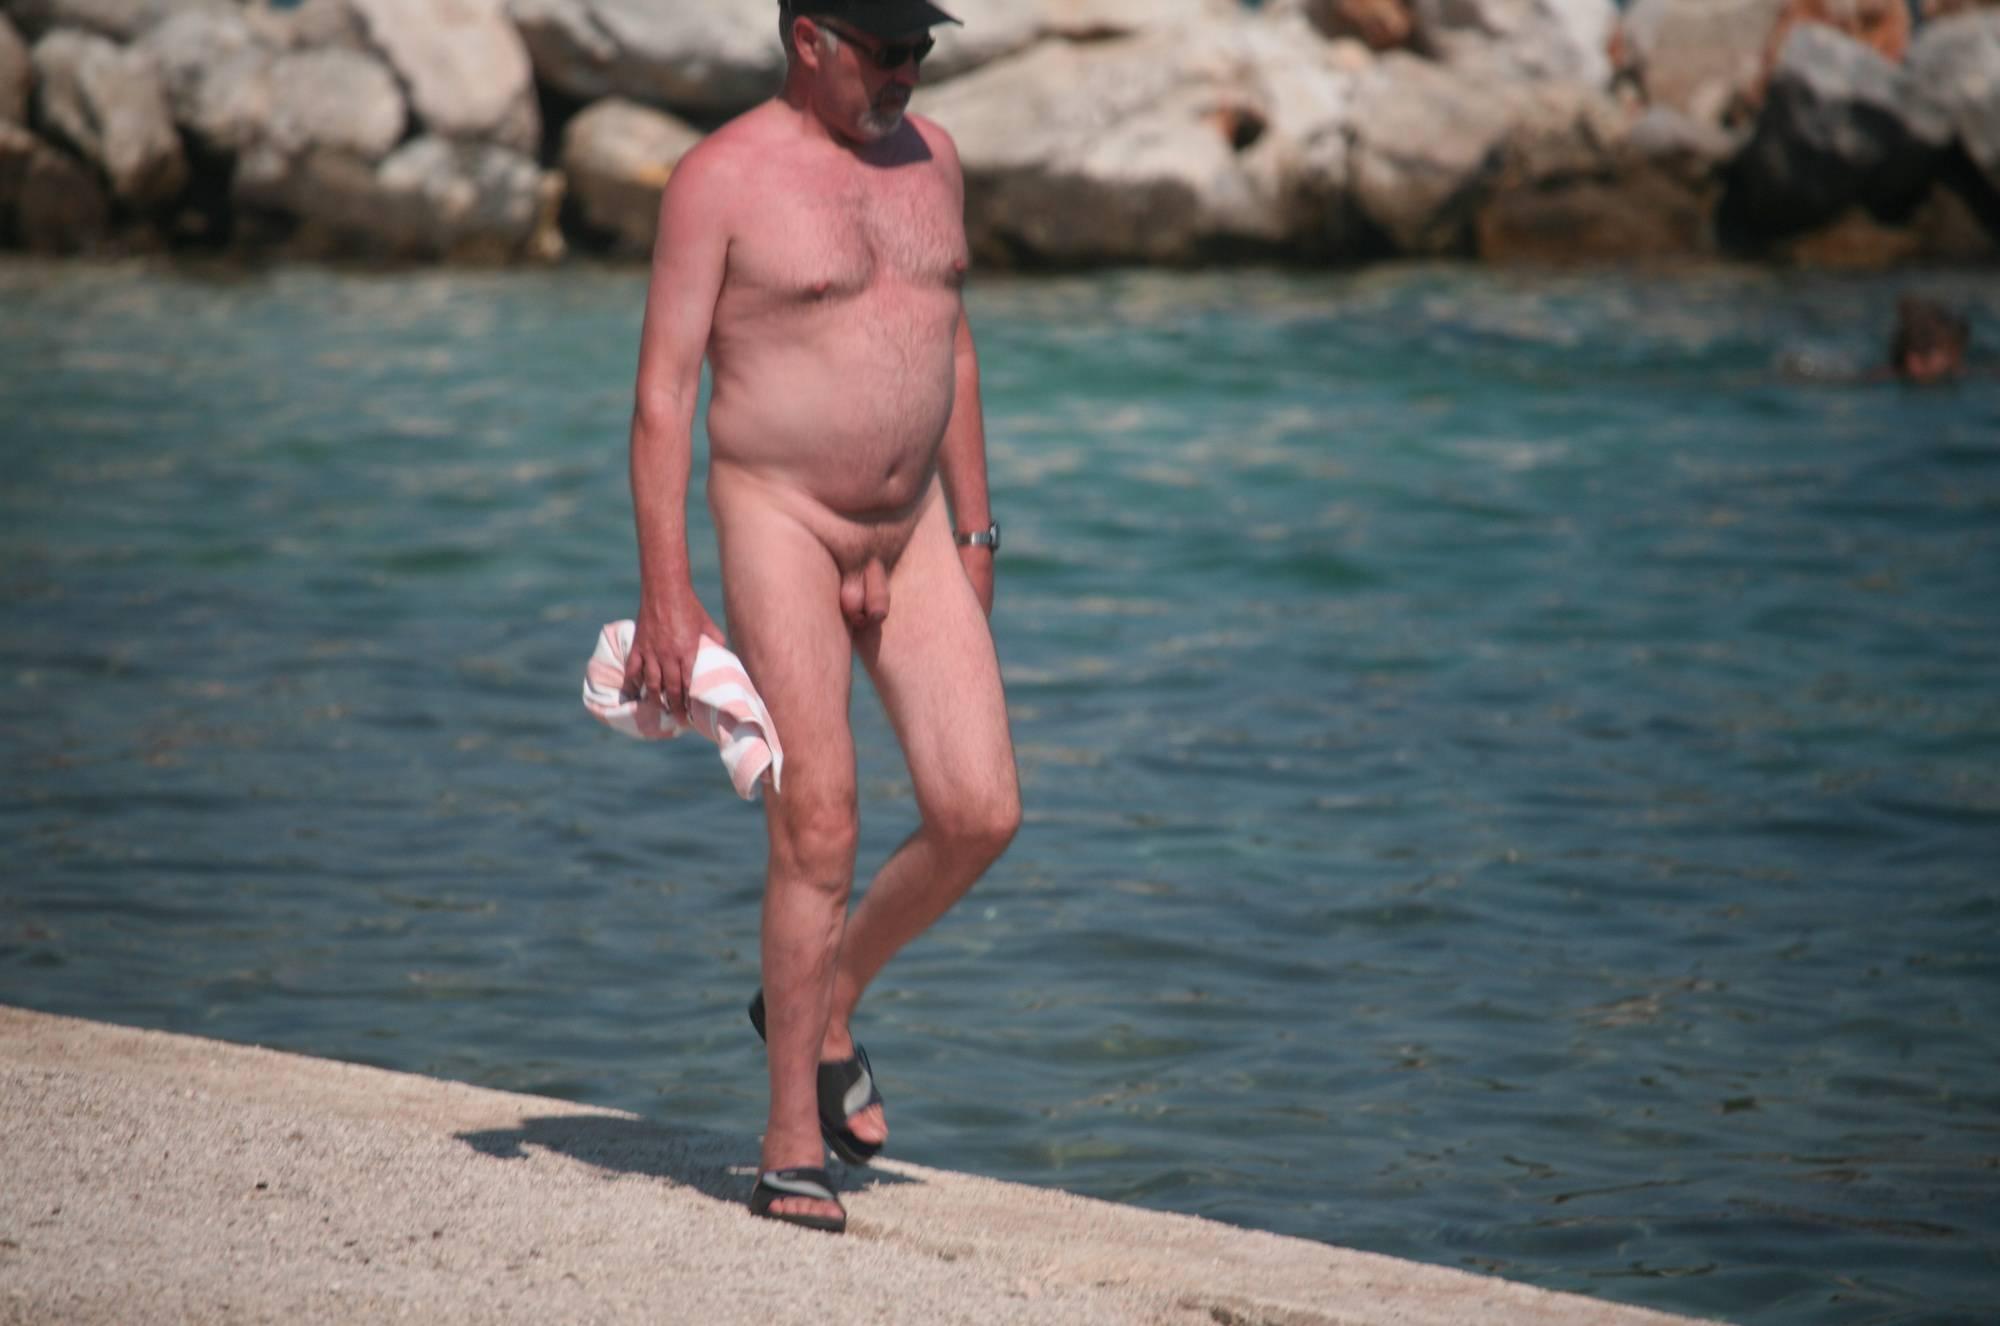 Nudist Gallery Nudist Beach Pedestrians - 2